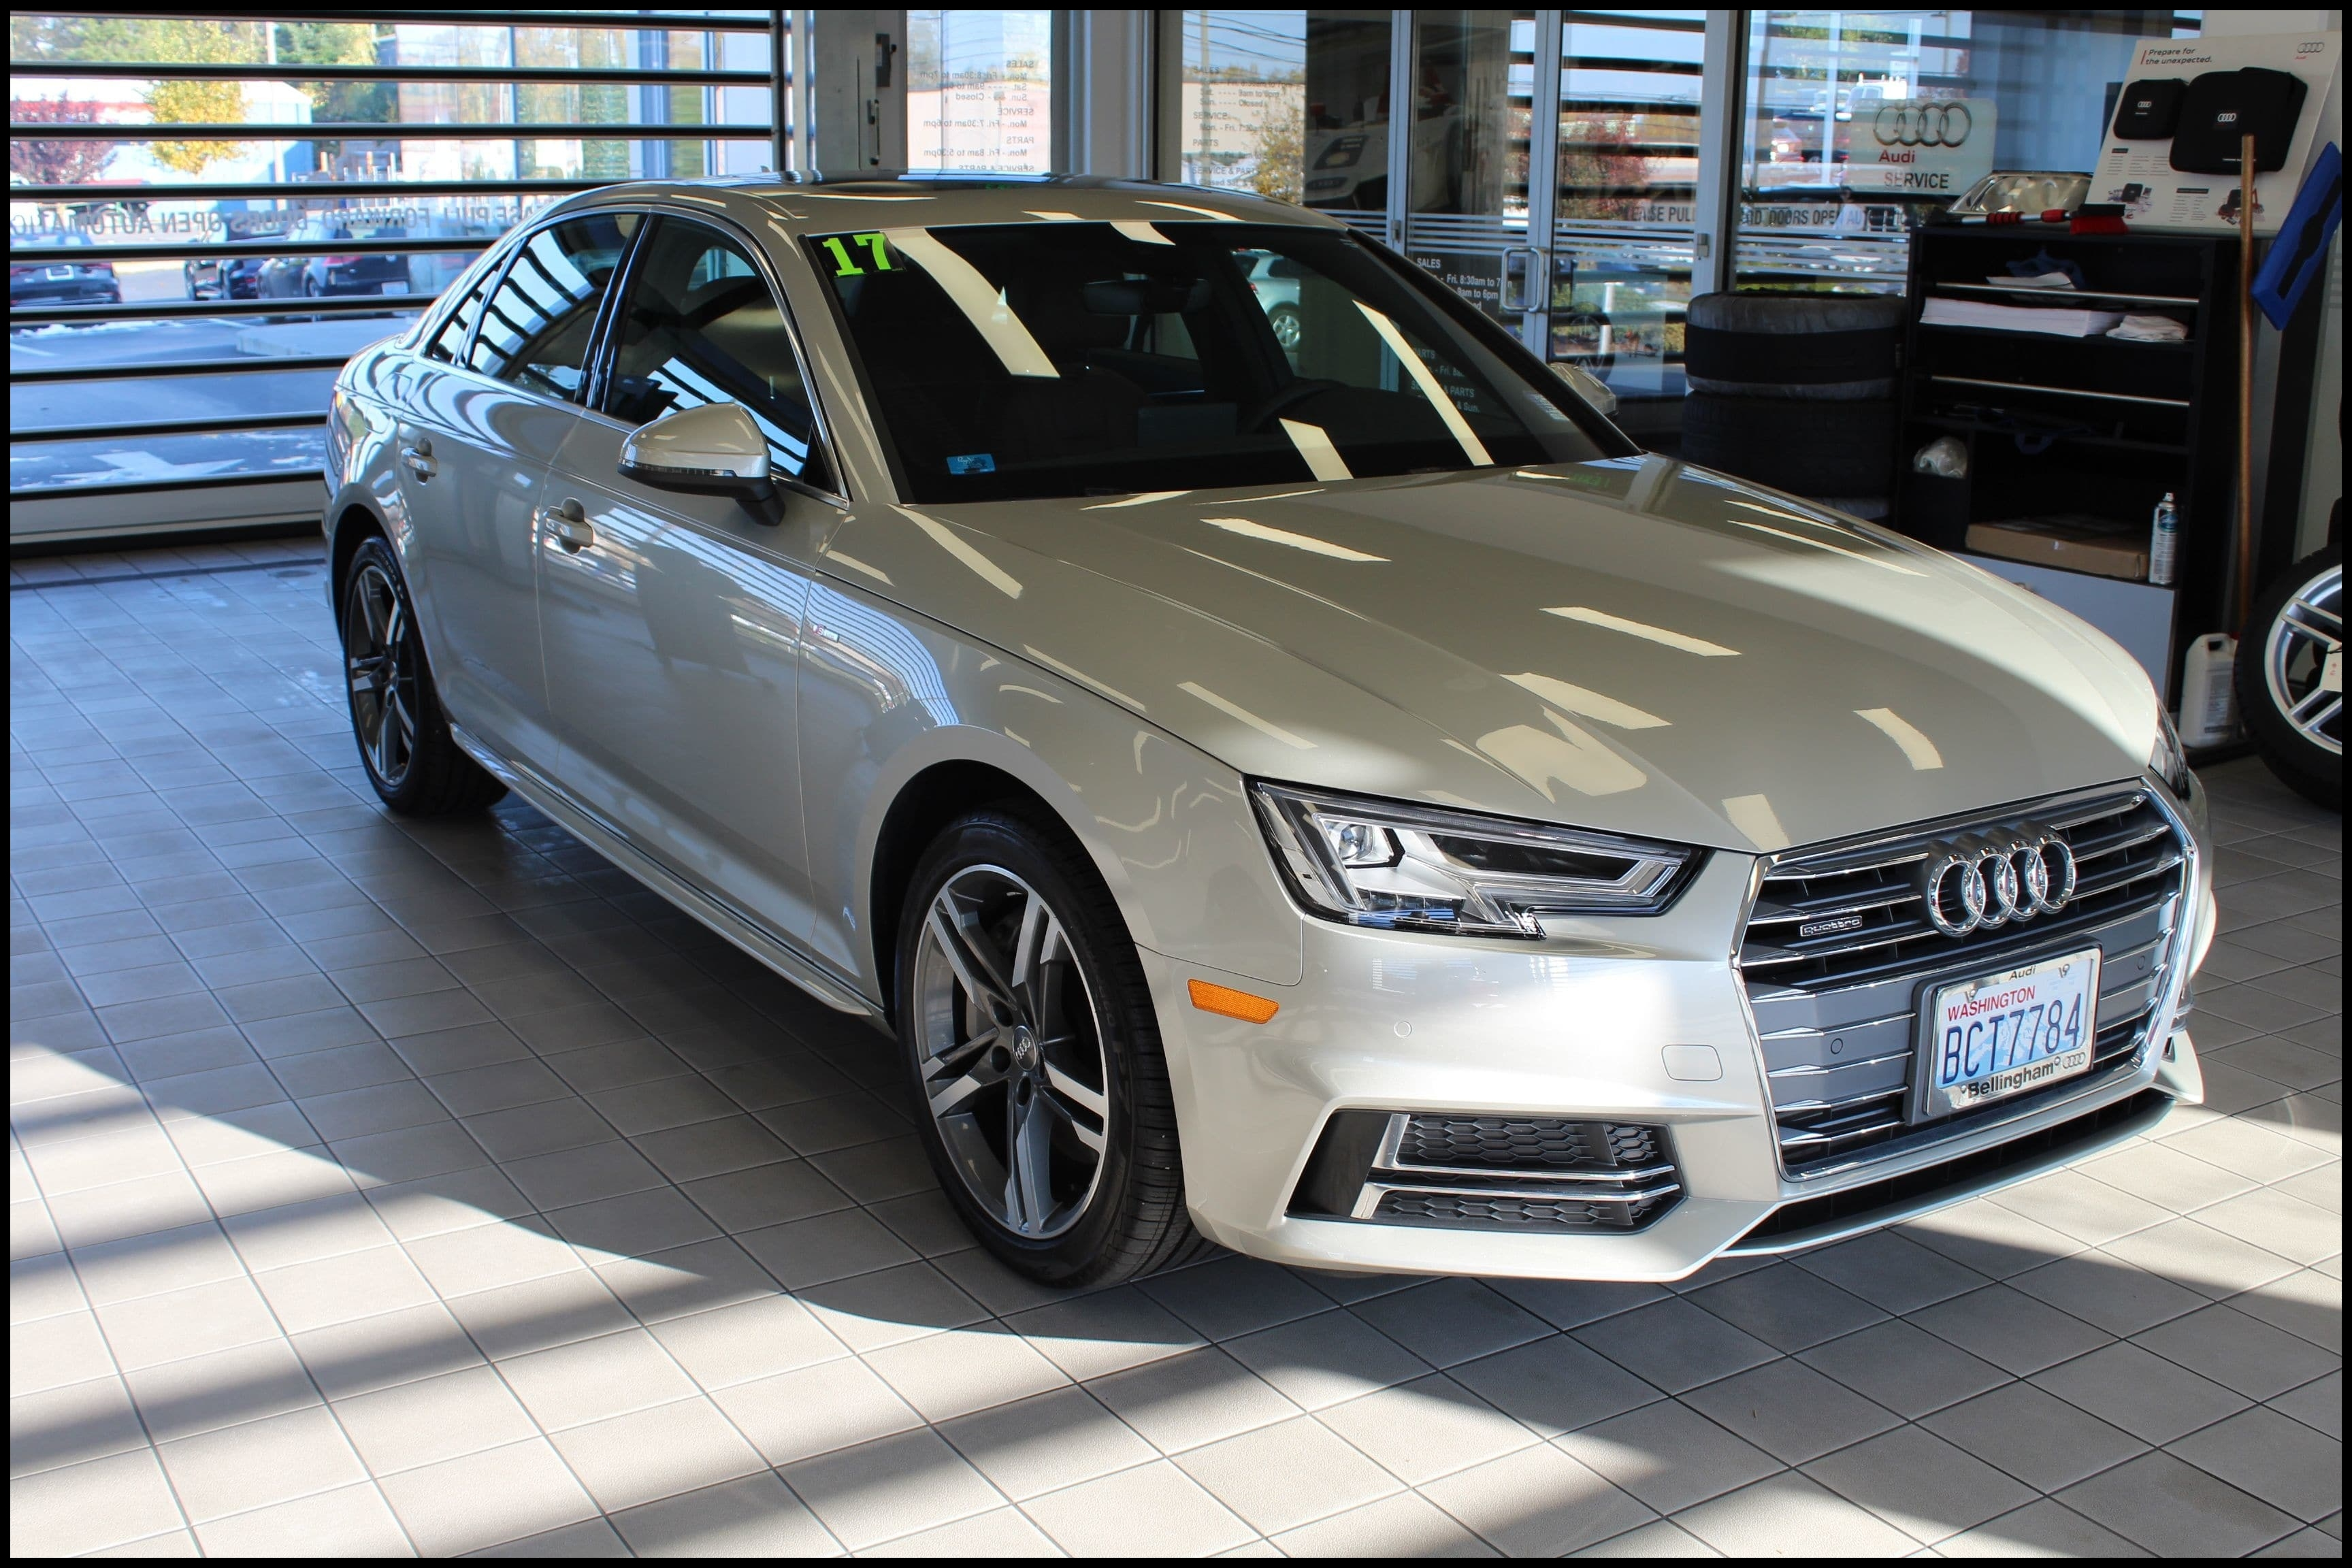 Beautiful Audi Danbury Pre Owned Latest Dream Cars